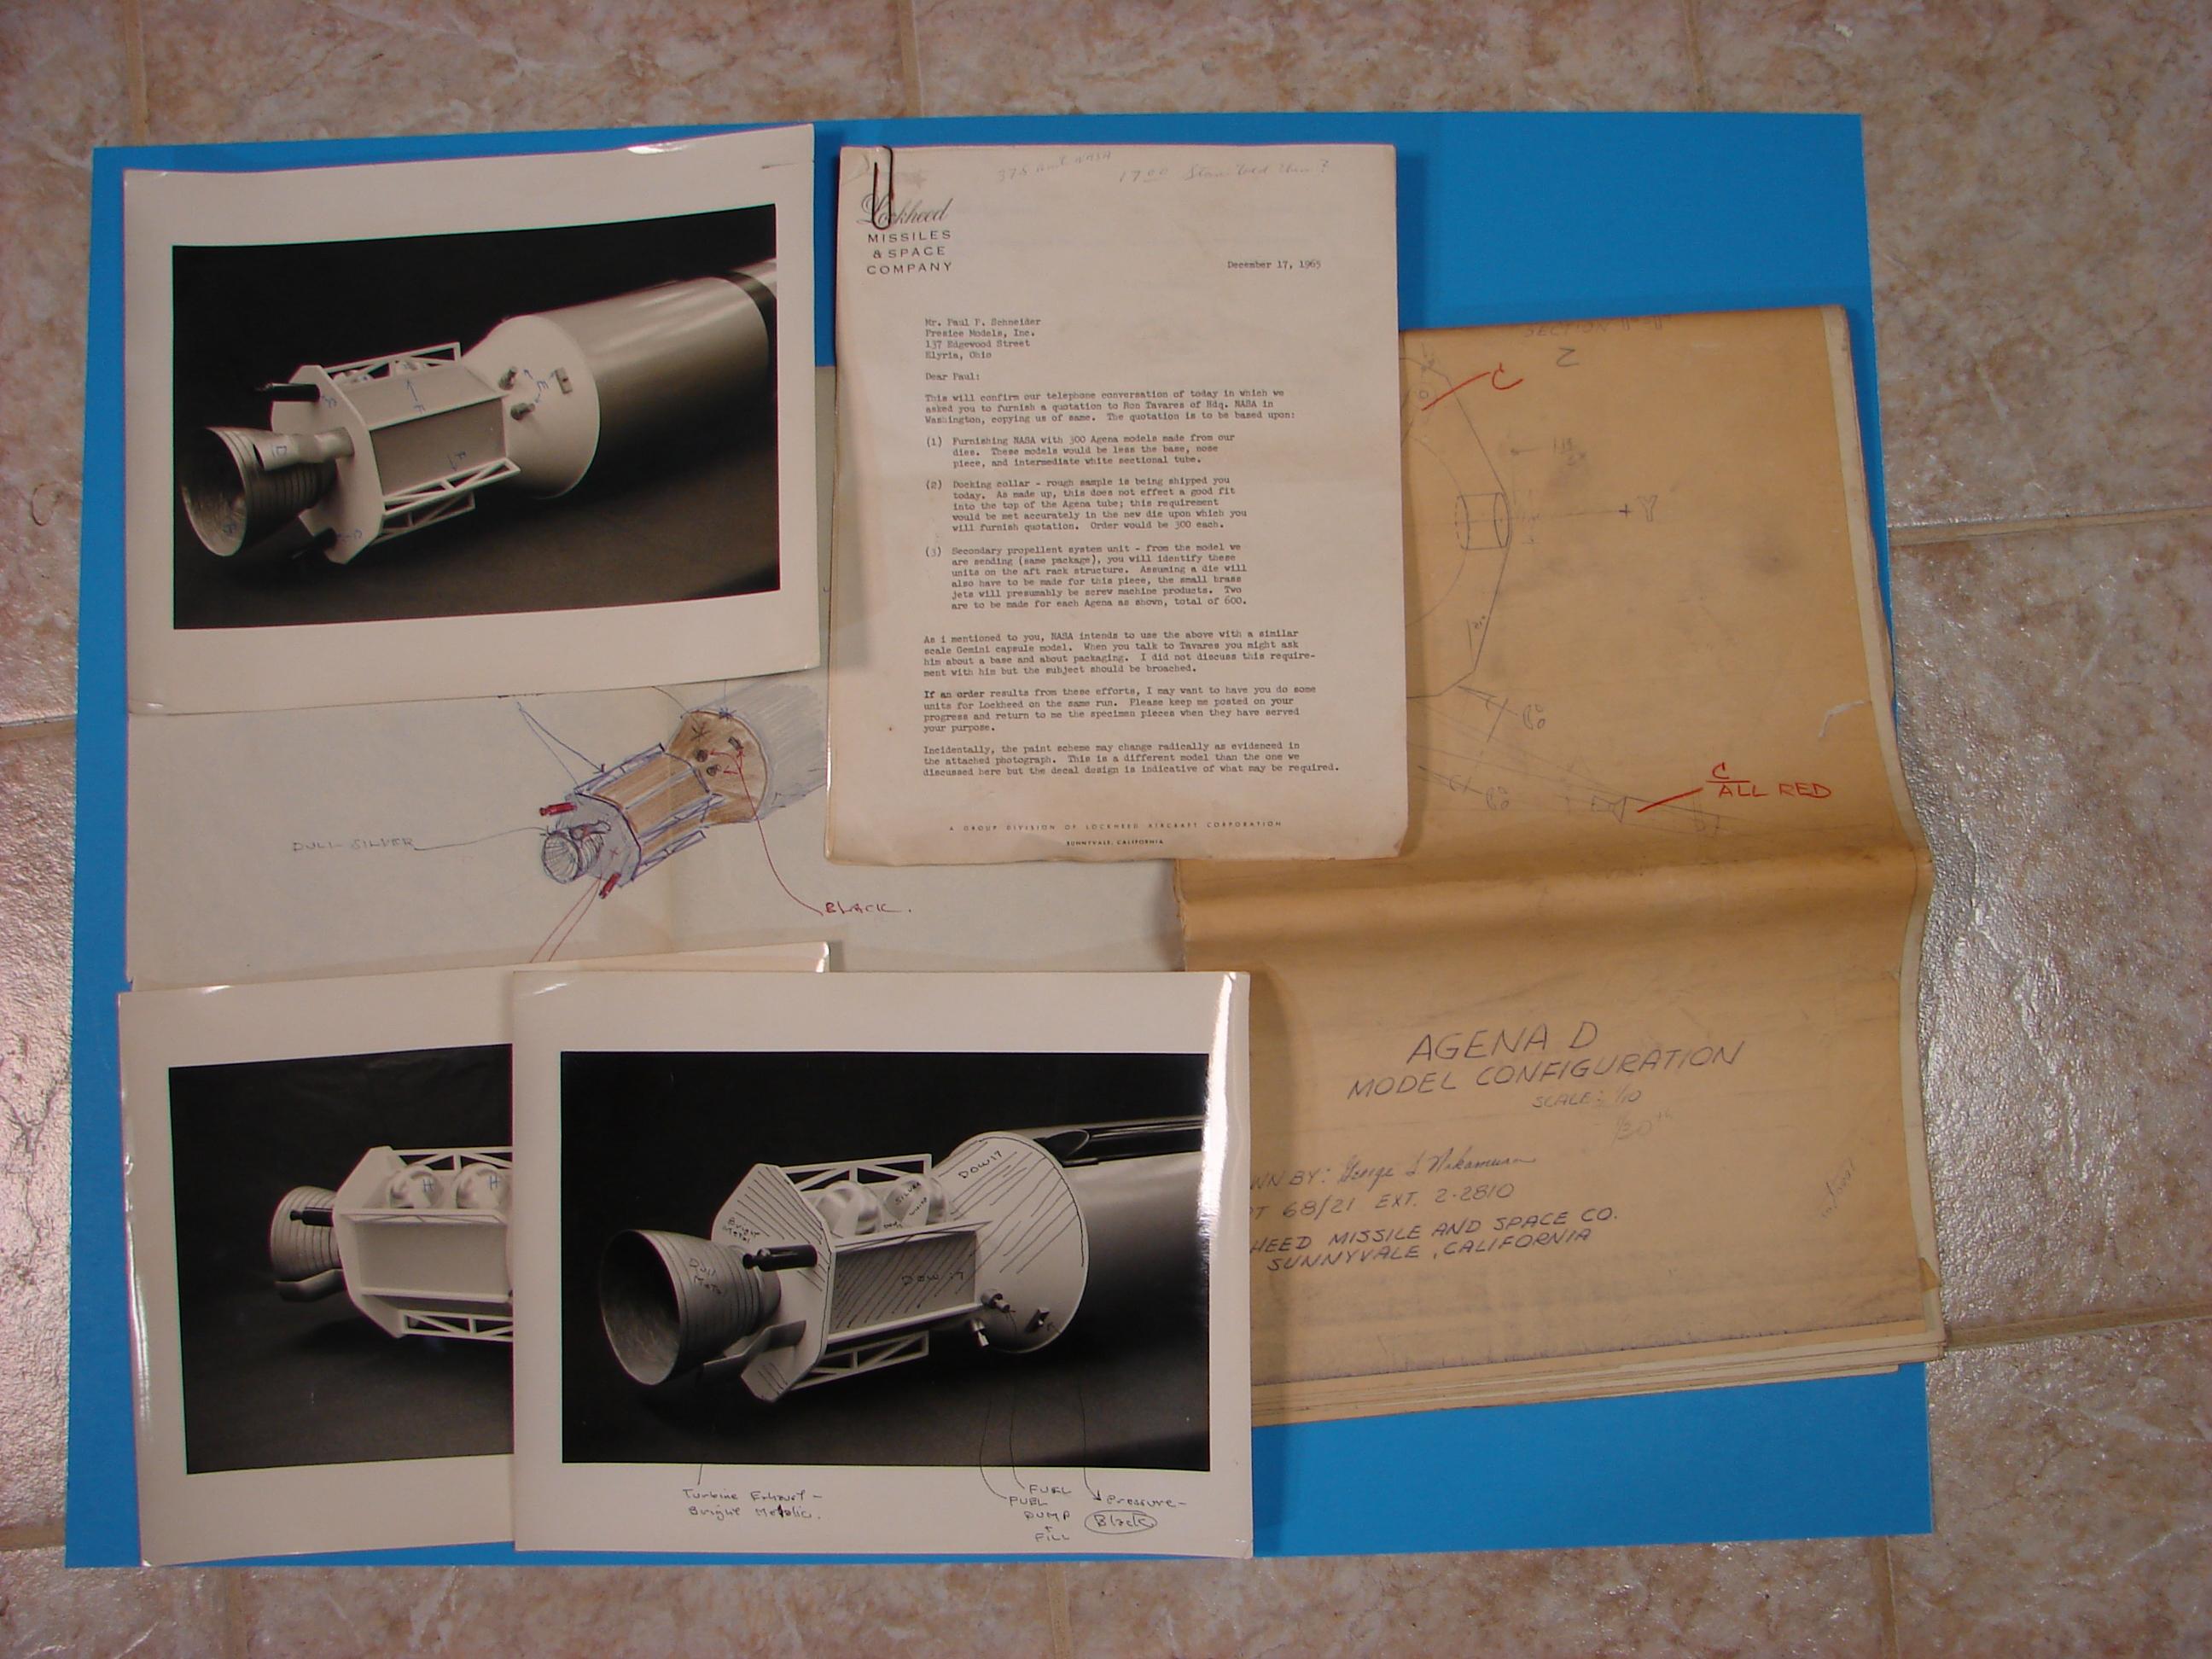 Lockheed Agena plans 12.16.65